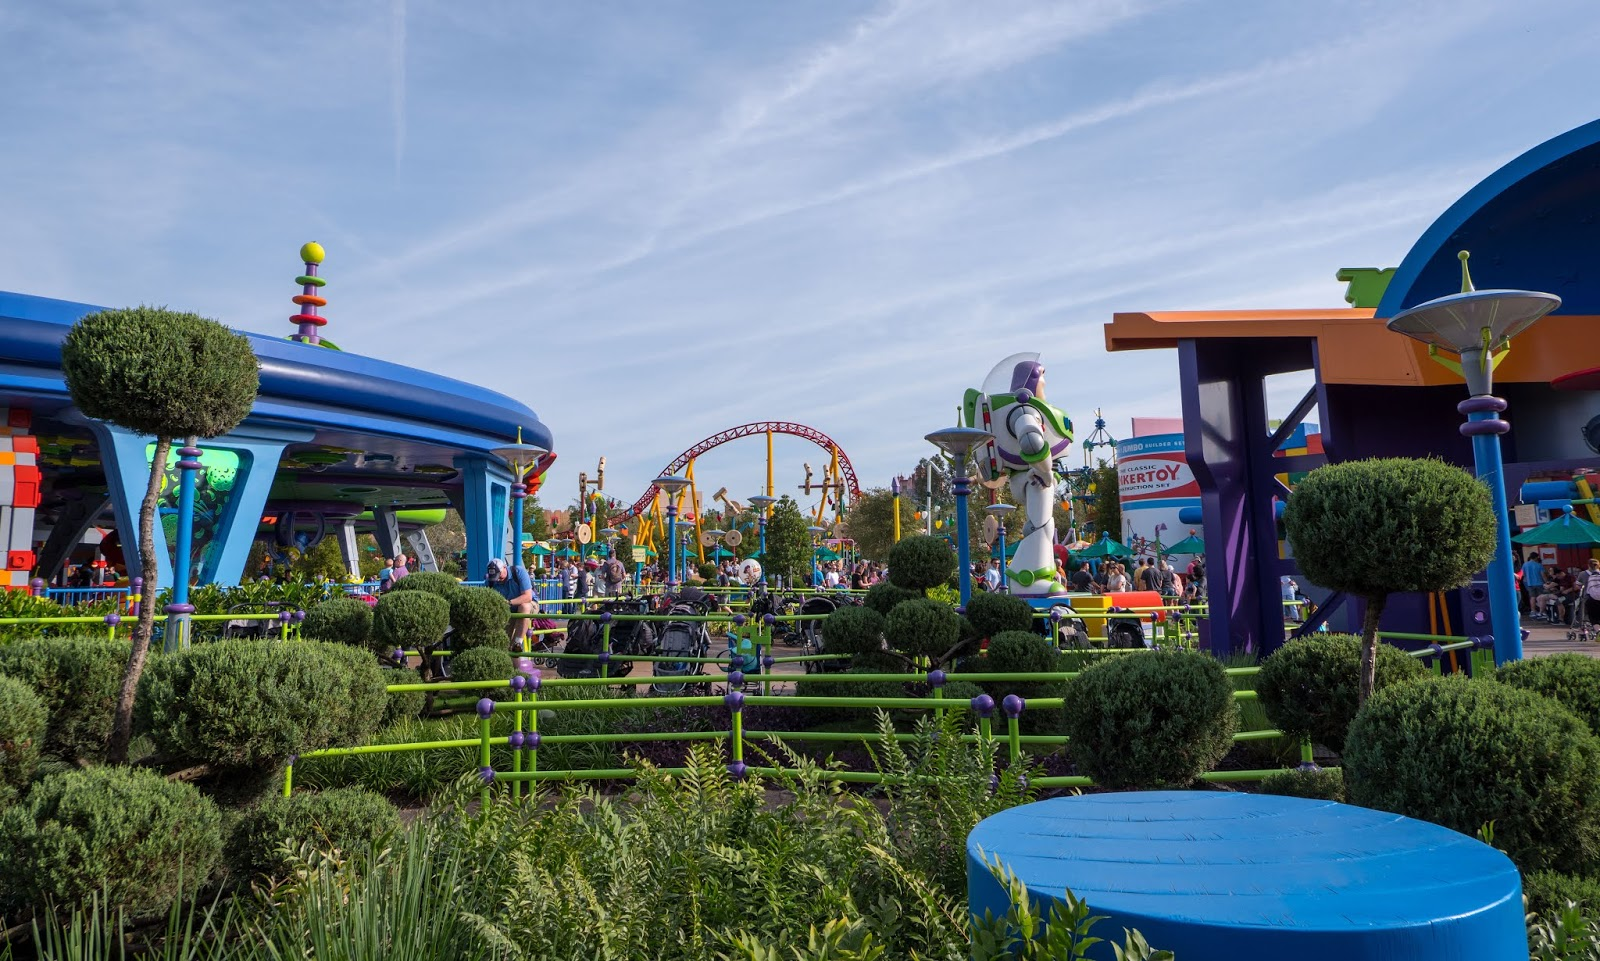 Toy Story Land at Disney's Hollywood Studios, Walt Disney World